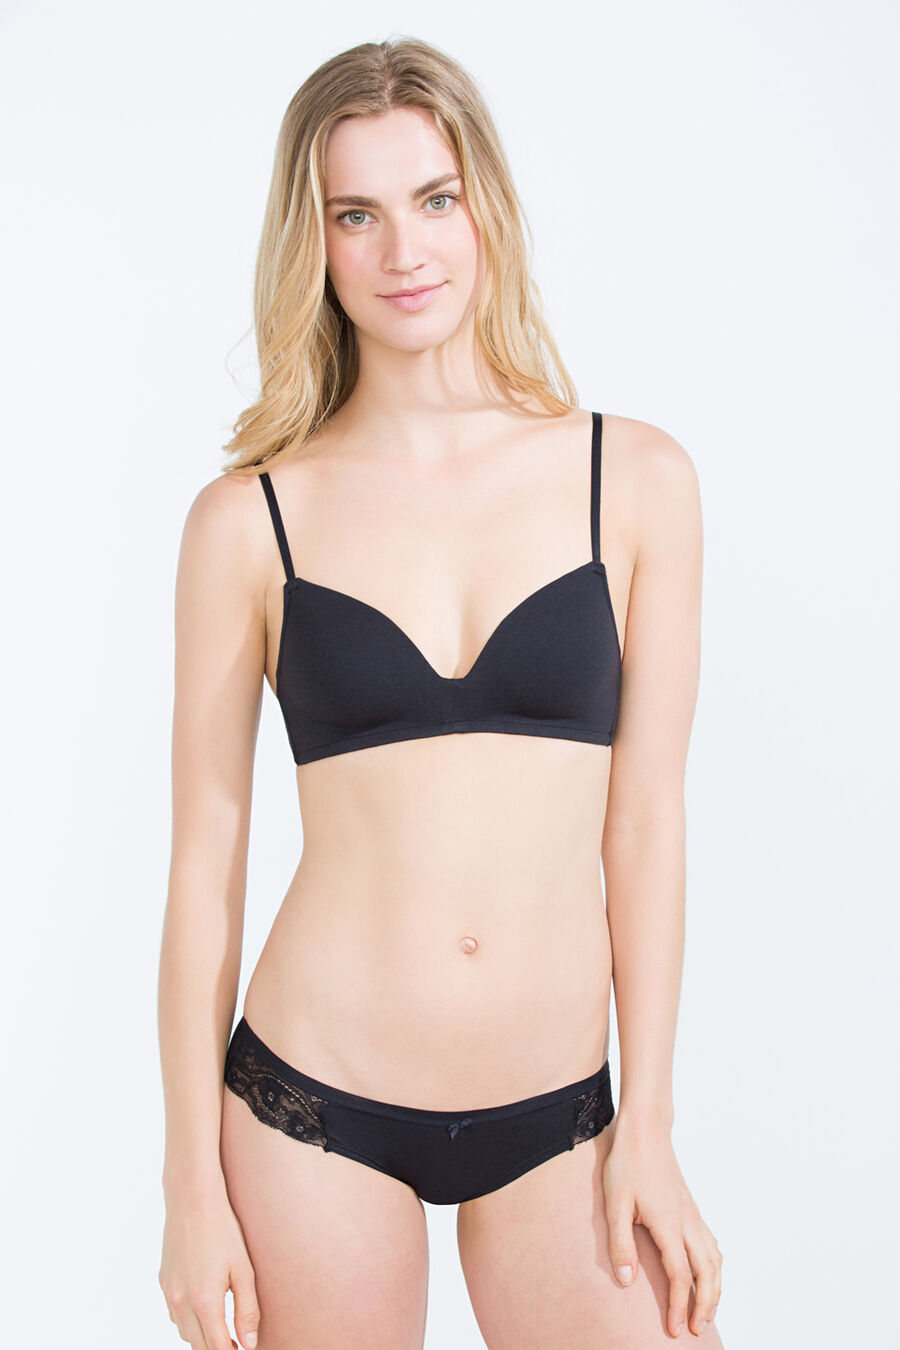 Cotton padded wireless bra